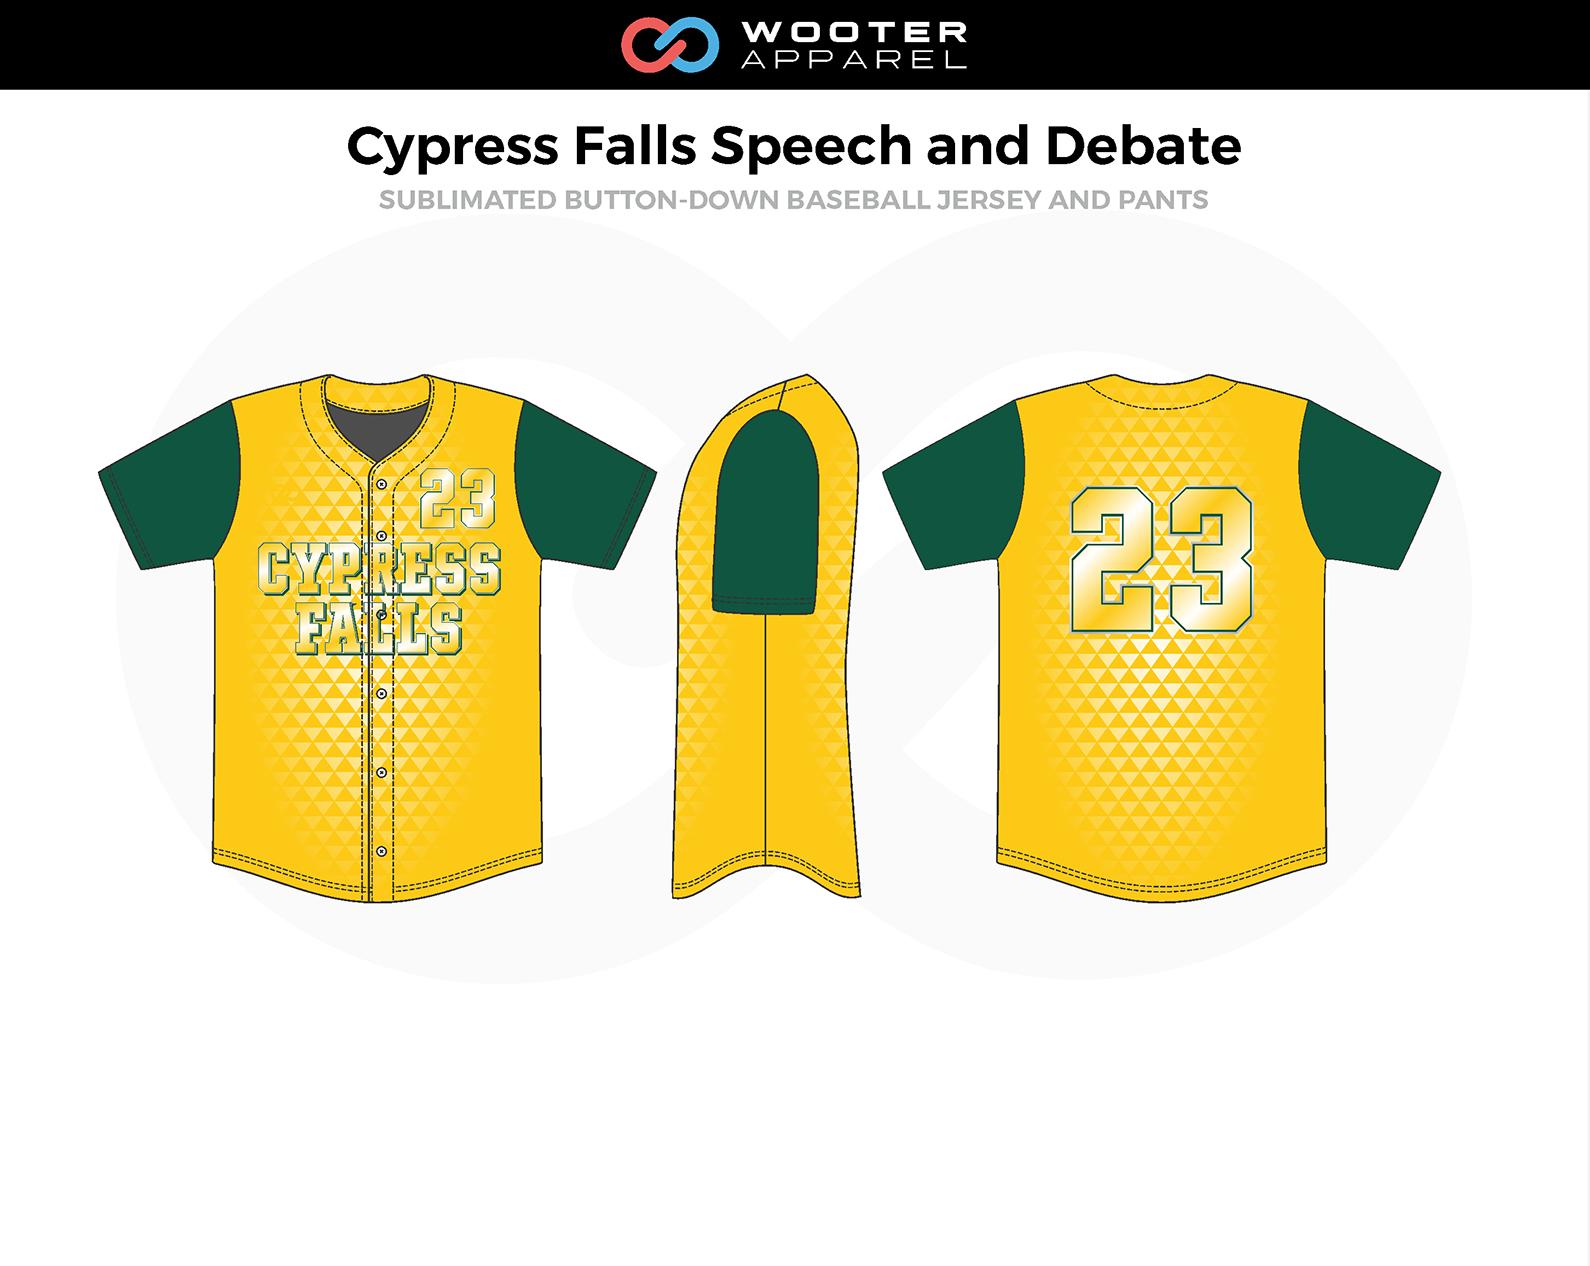 2018-09-10 Cypress Falls Speech and Debate 3.png